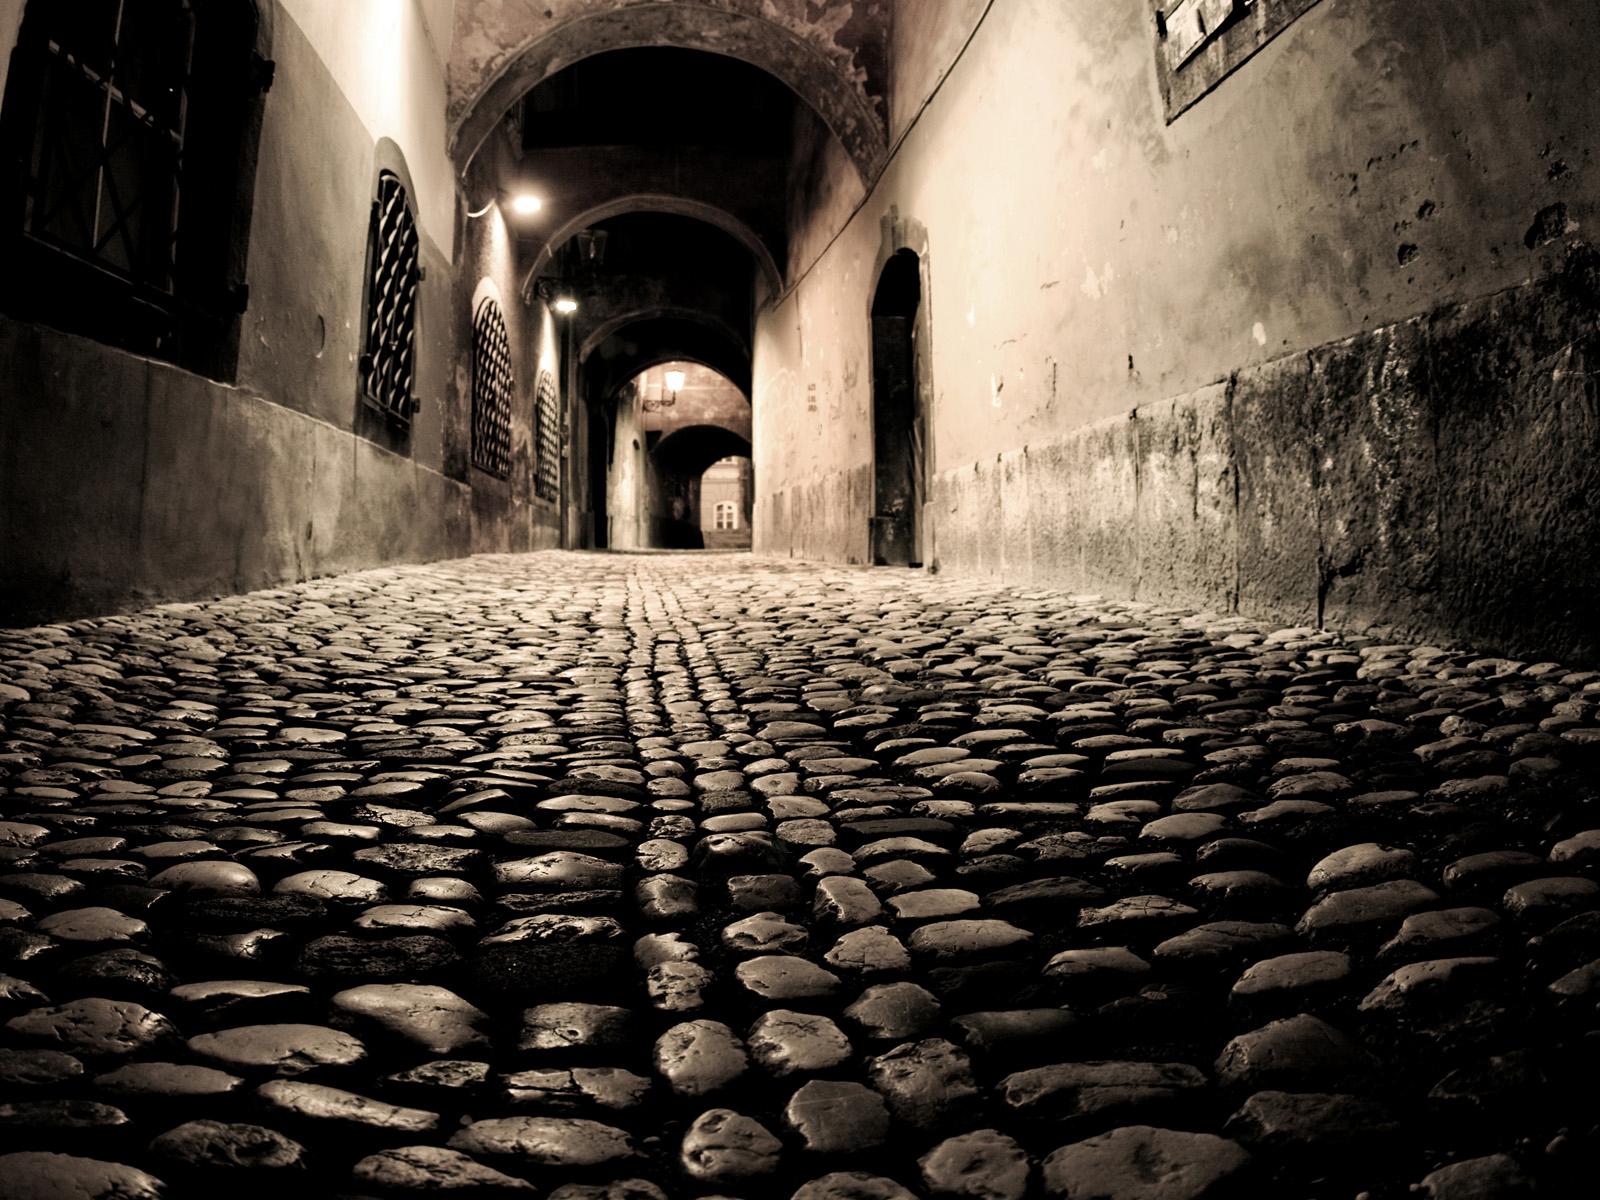 Stone Paving Old Street Night Lighting HD Wallpaper | HD ...